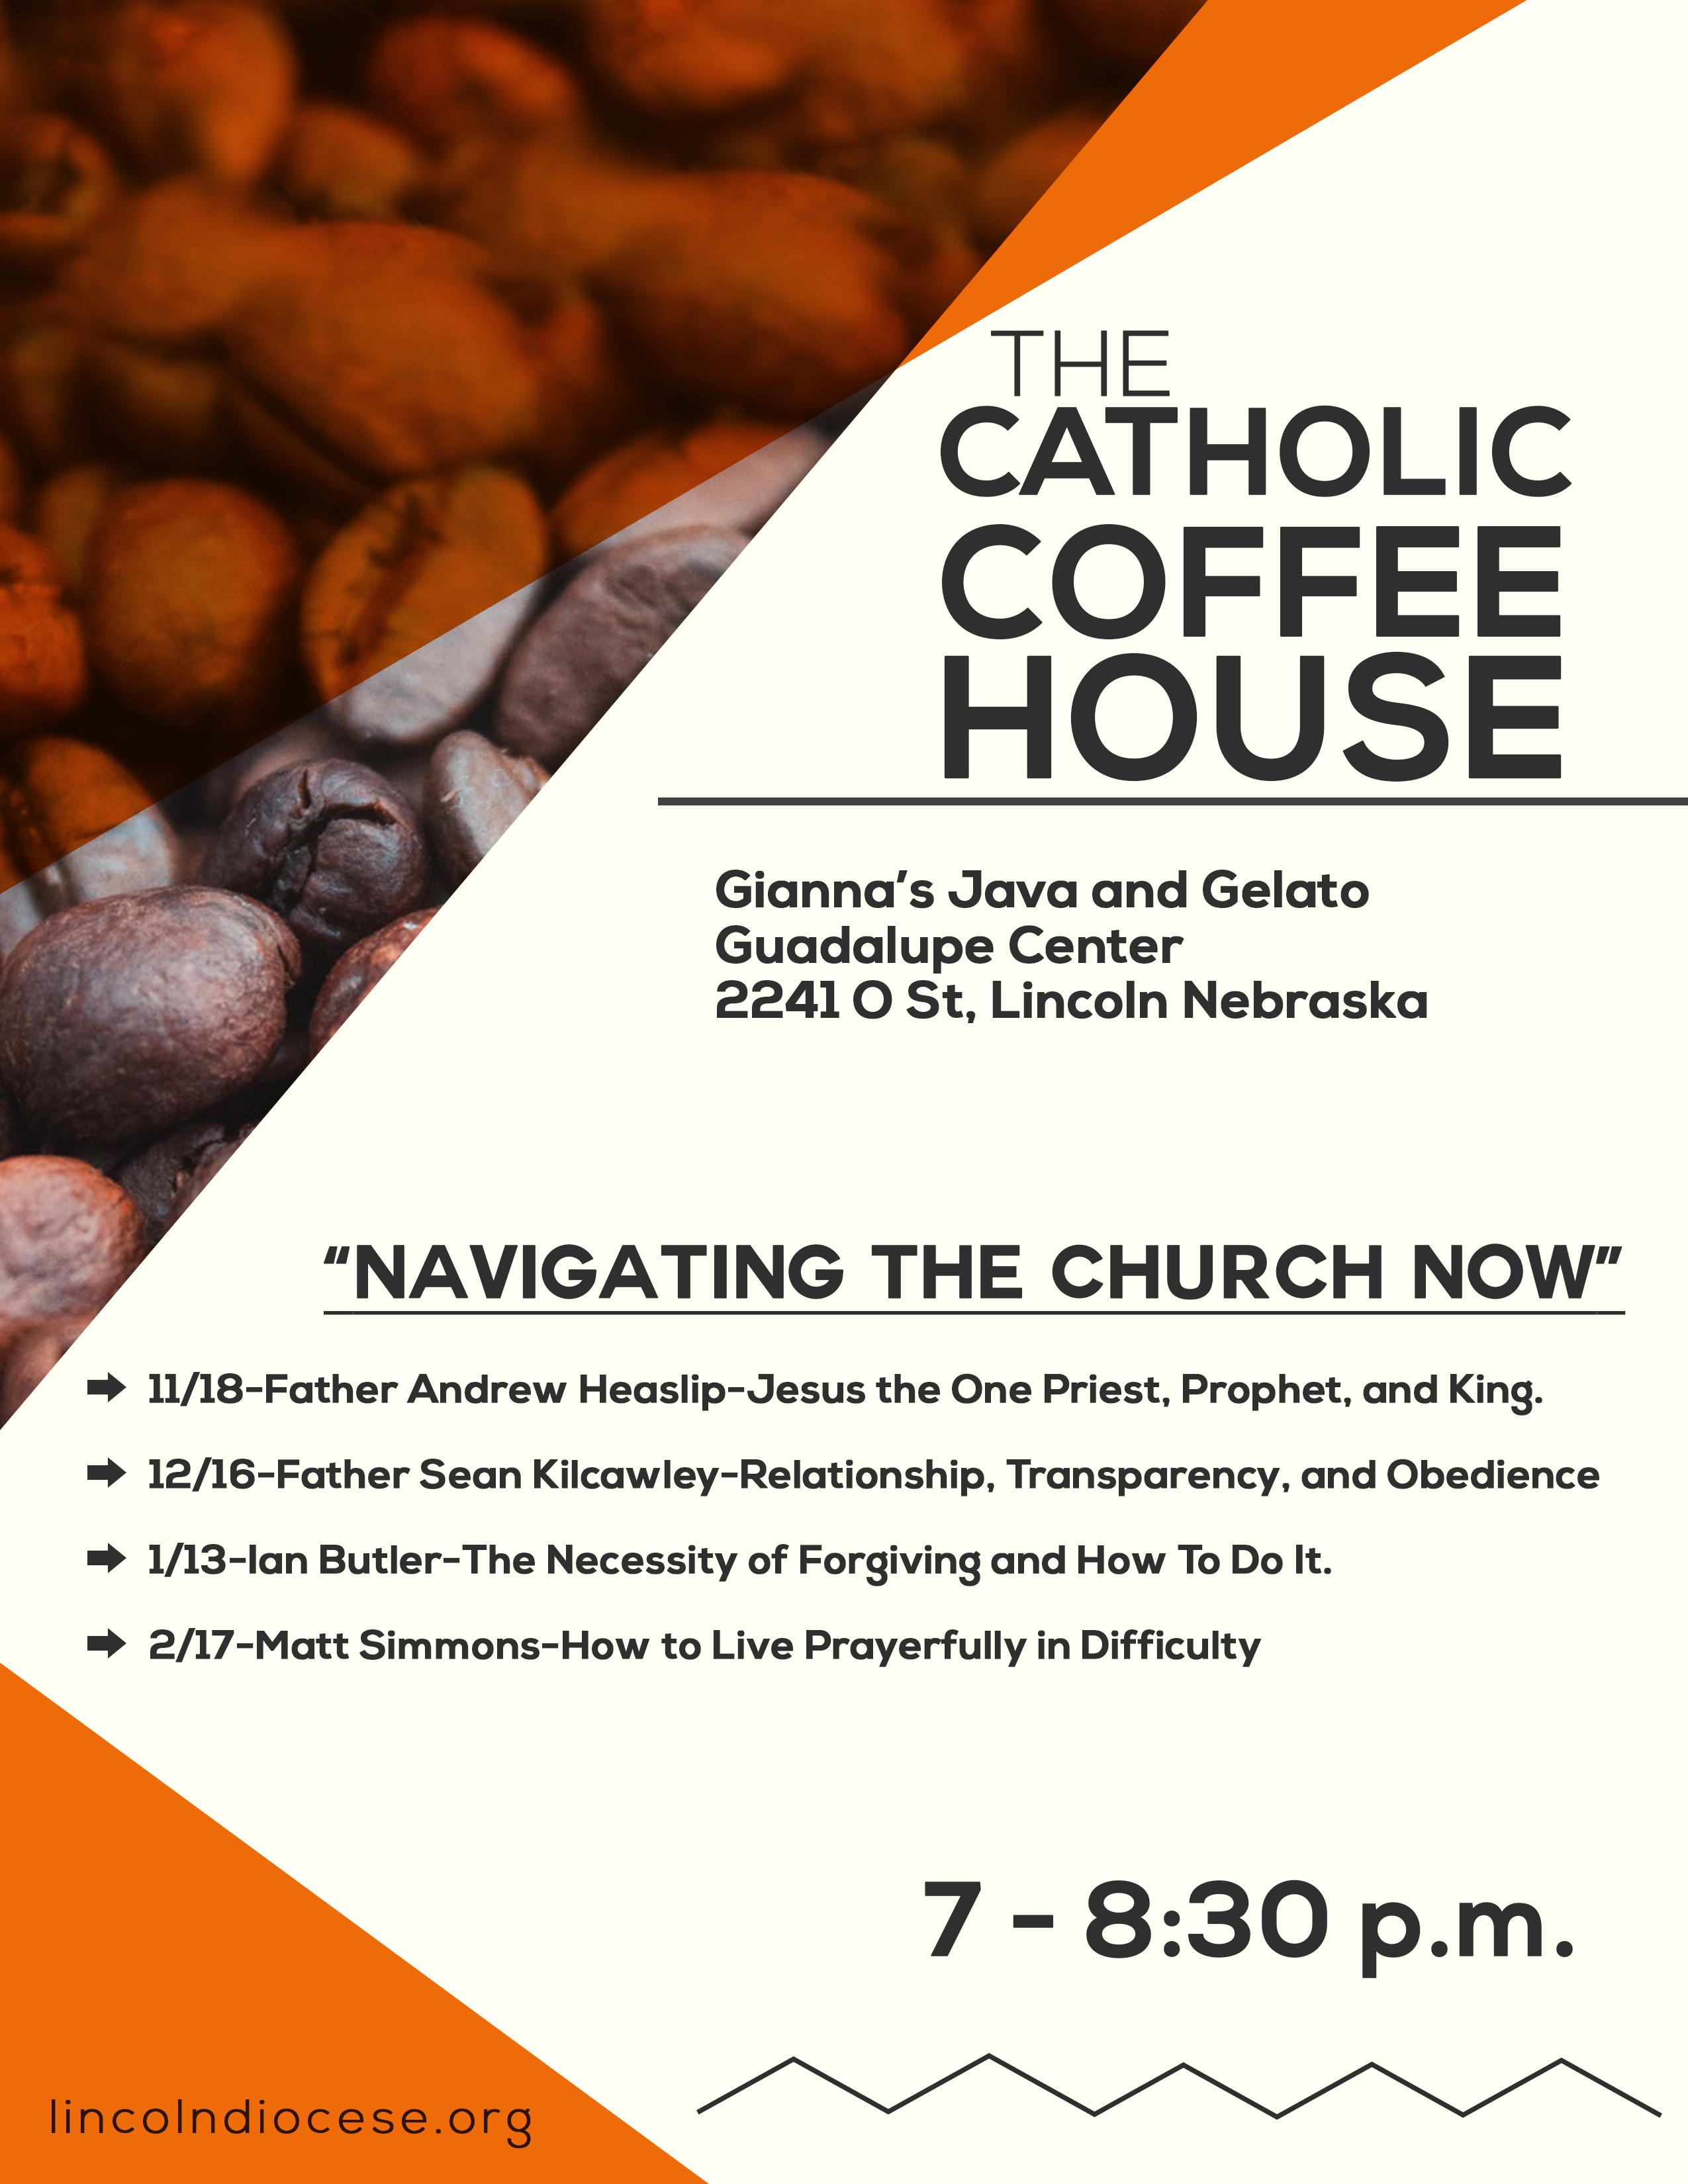 The Catholic Coffee House